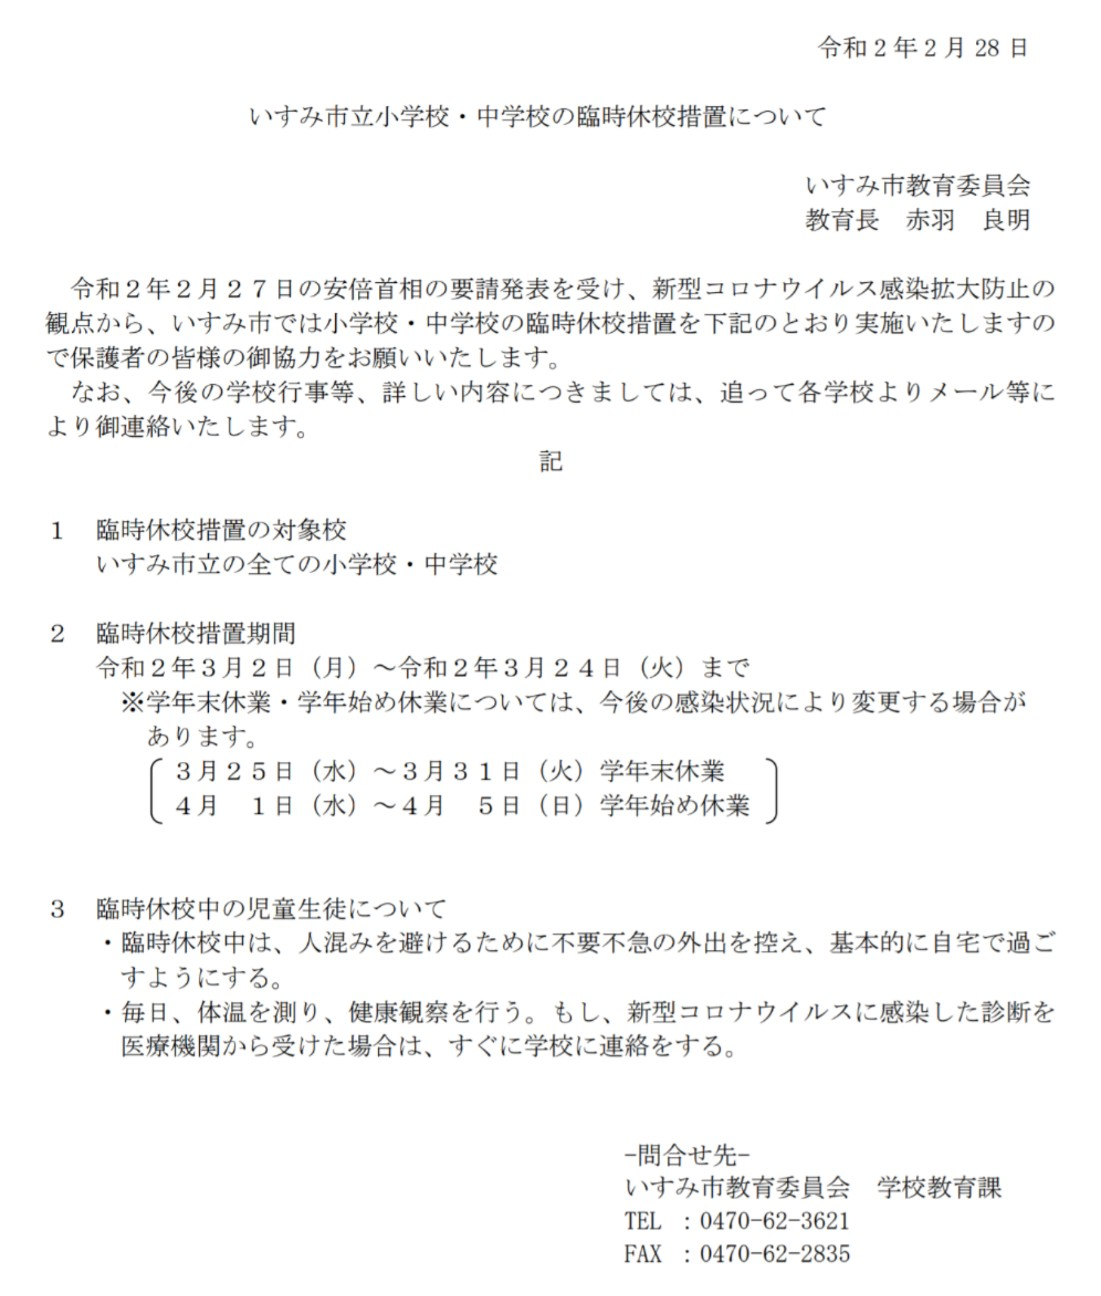 f:id:moriken-isumi:20200229050426j:image